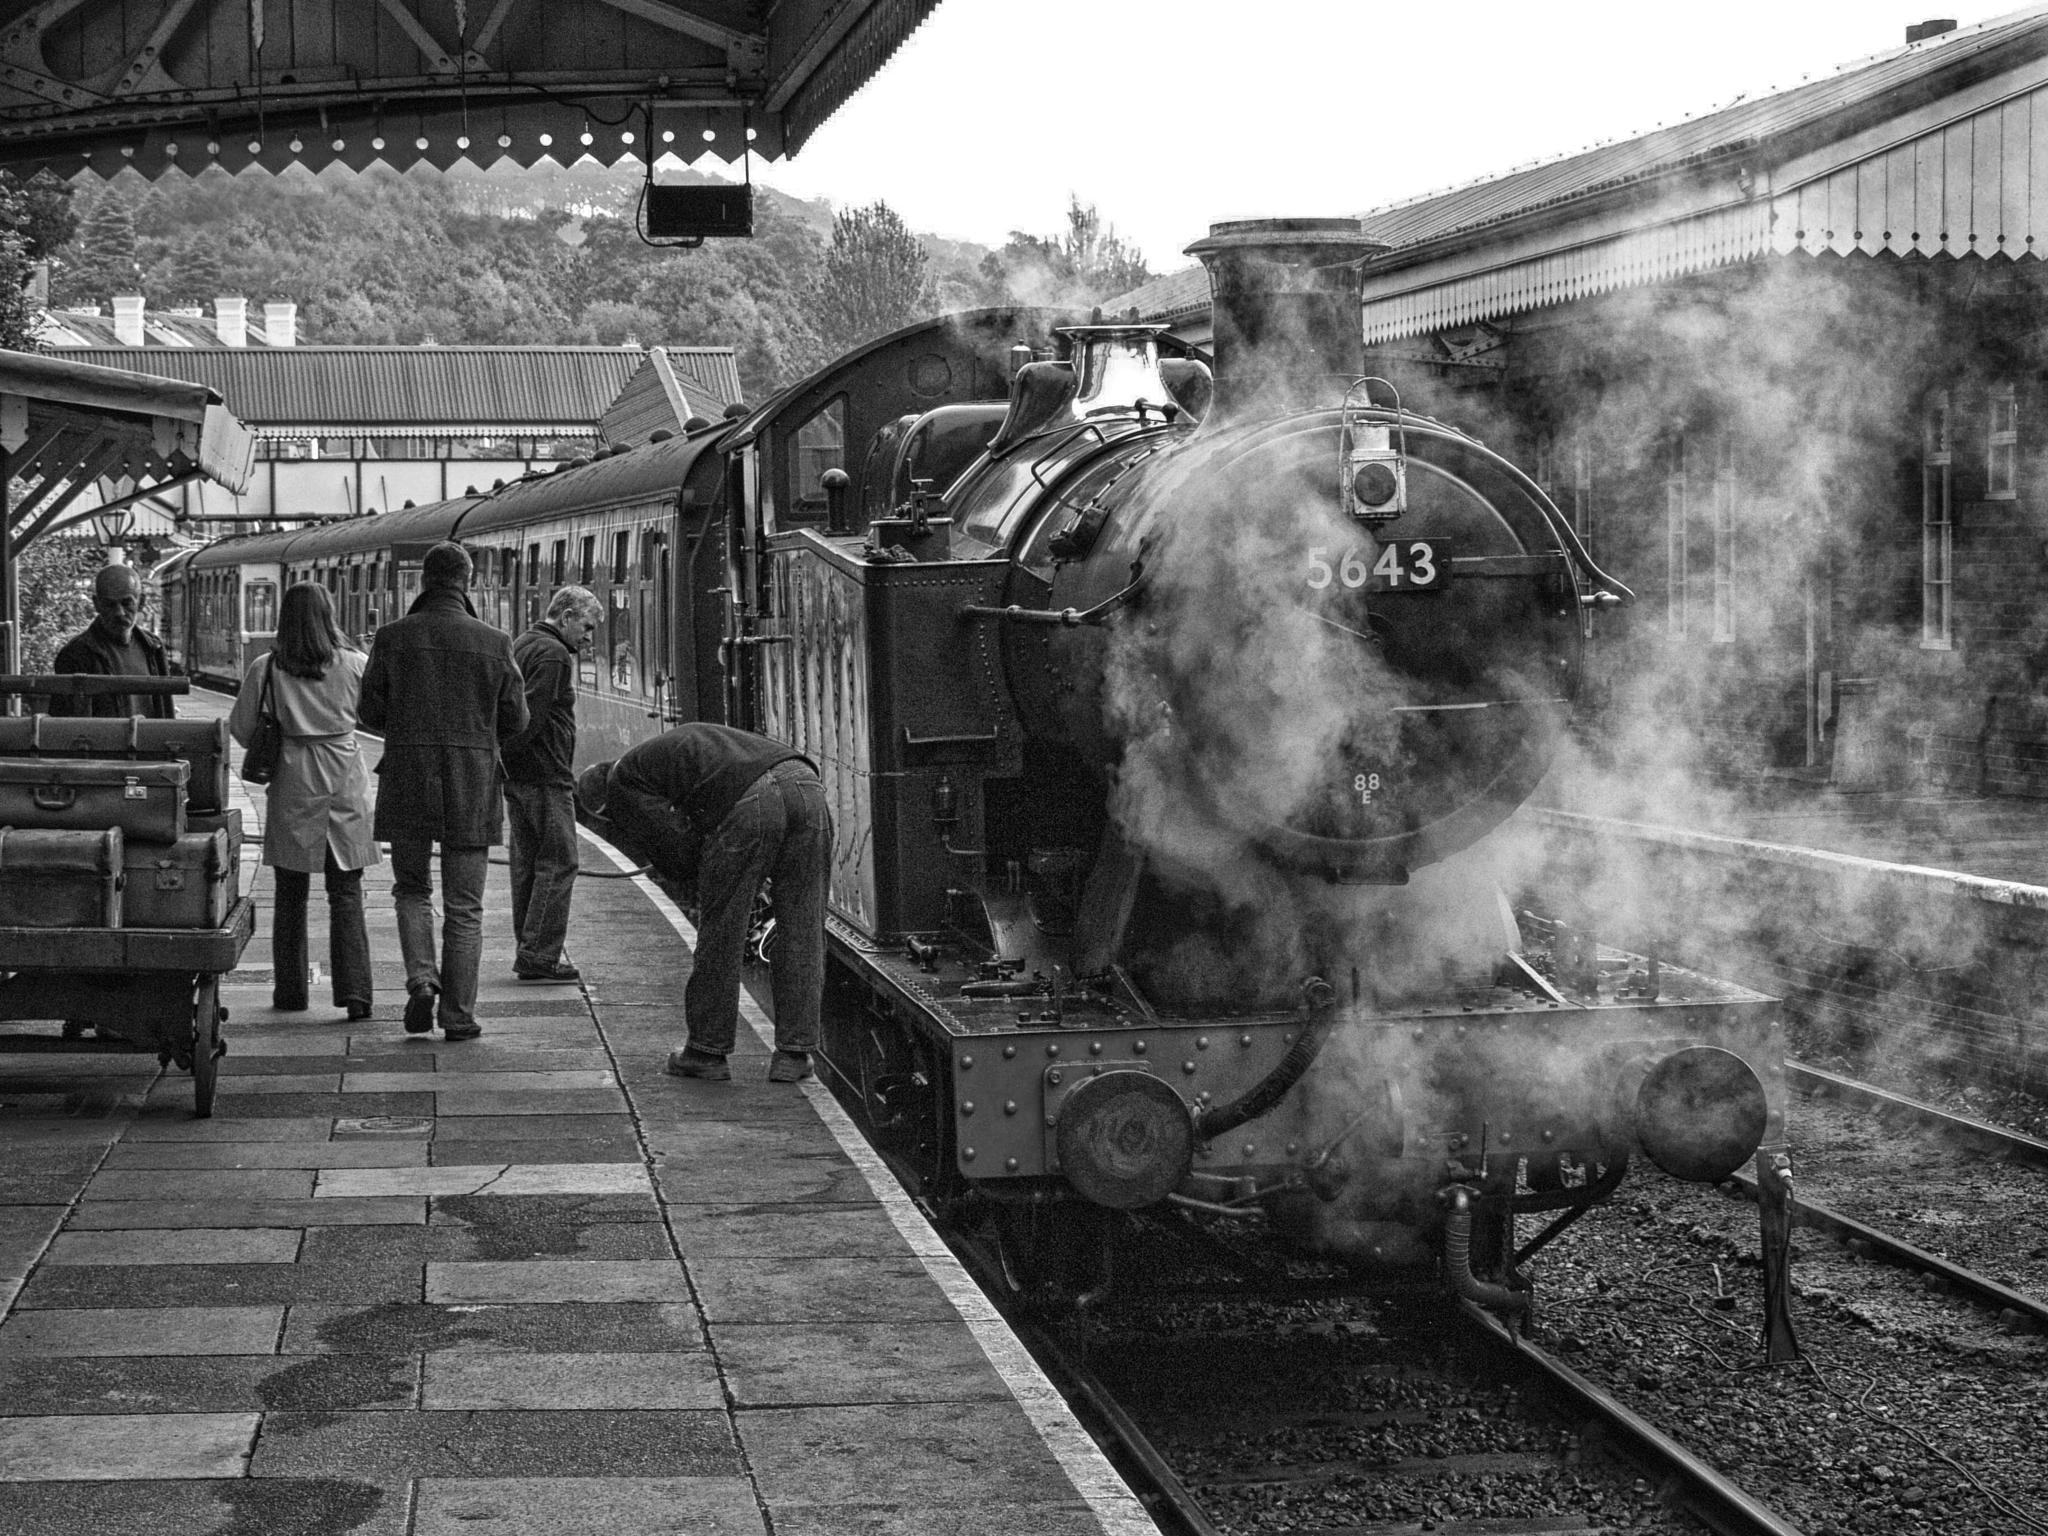 Llangollen Station by malco555